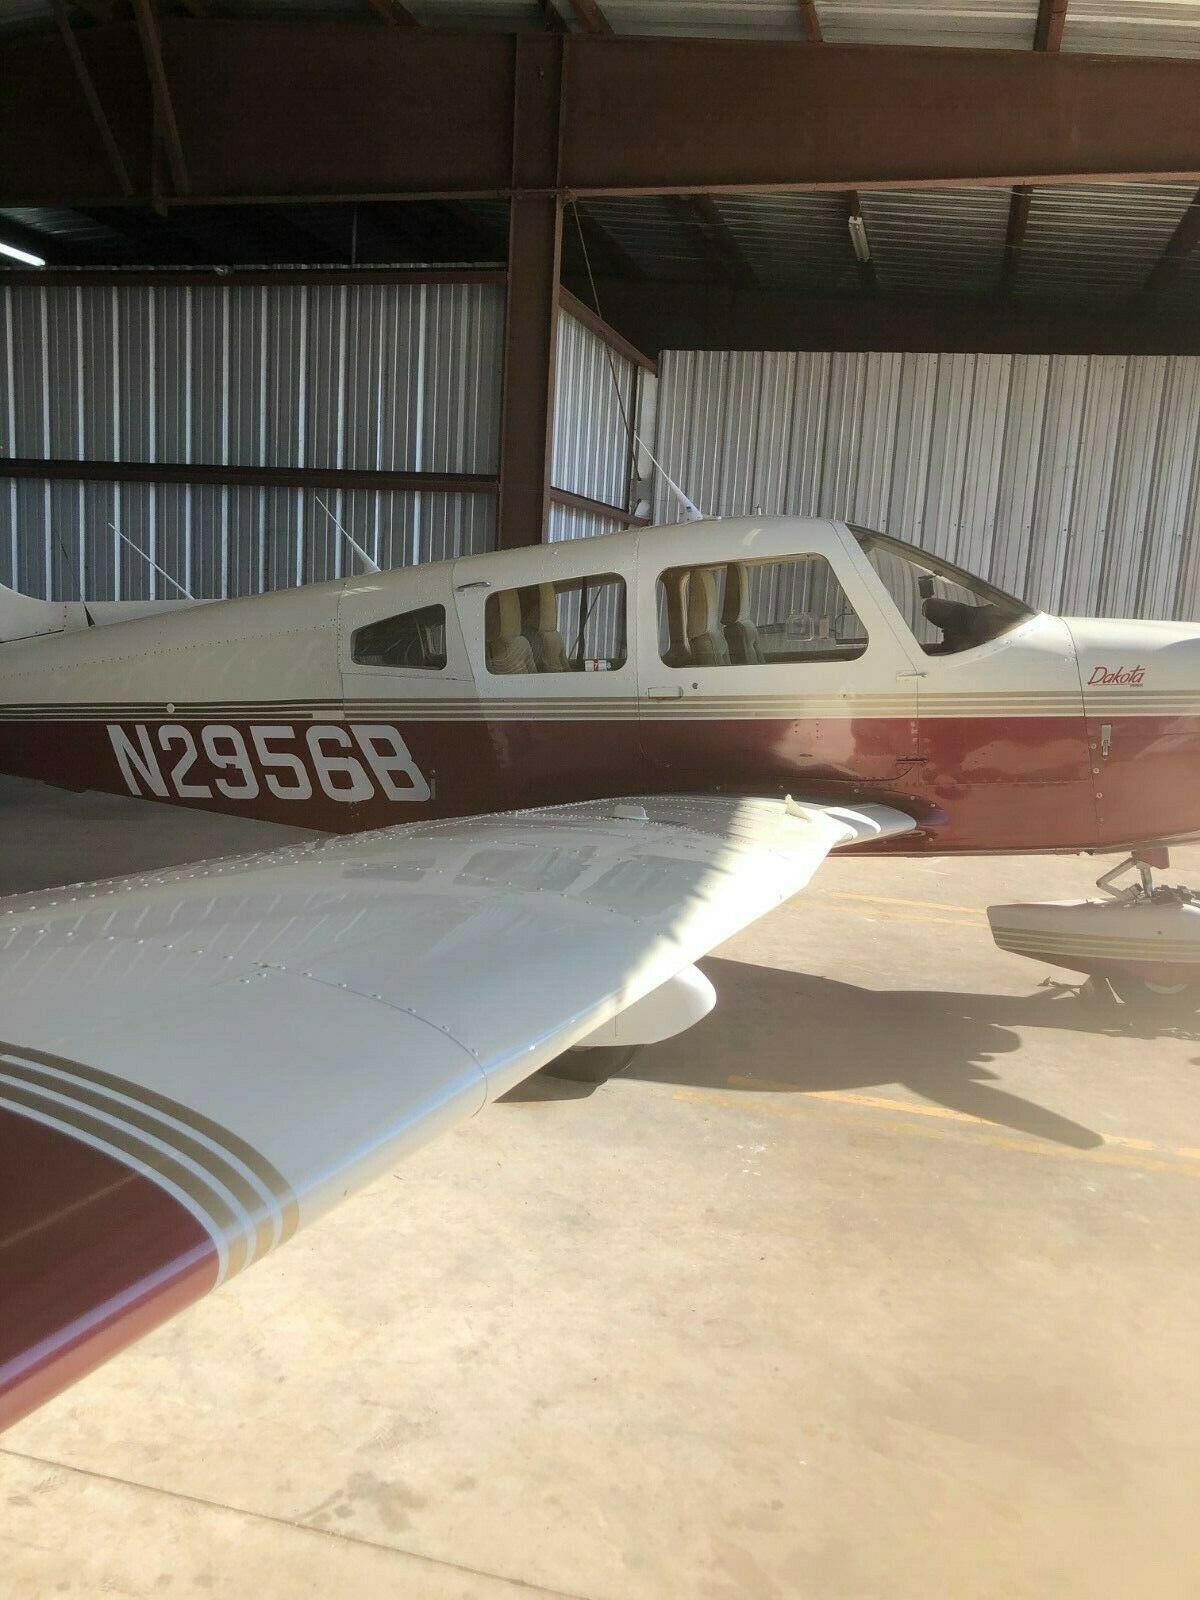 hangared 1979 Piper Dakota 28/236 aircraft